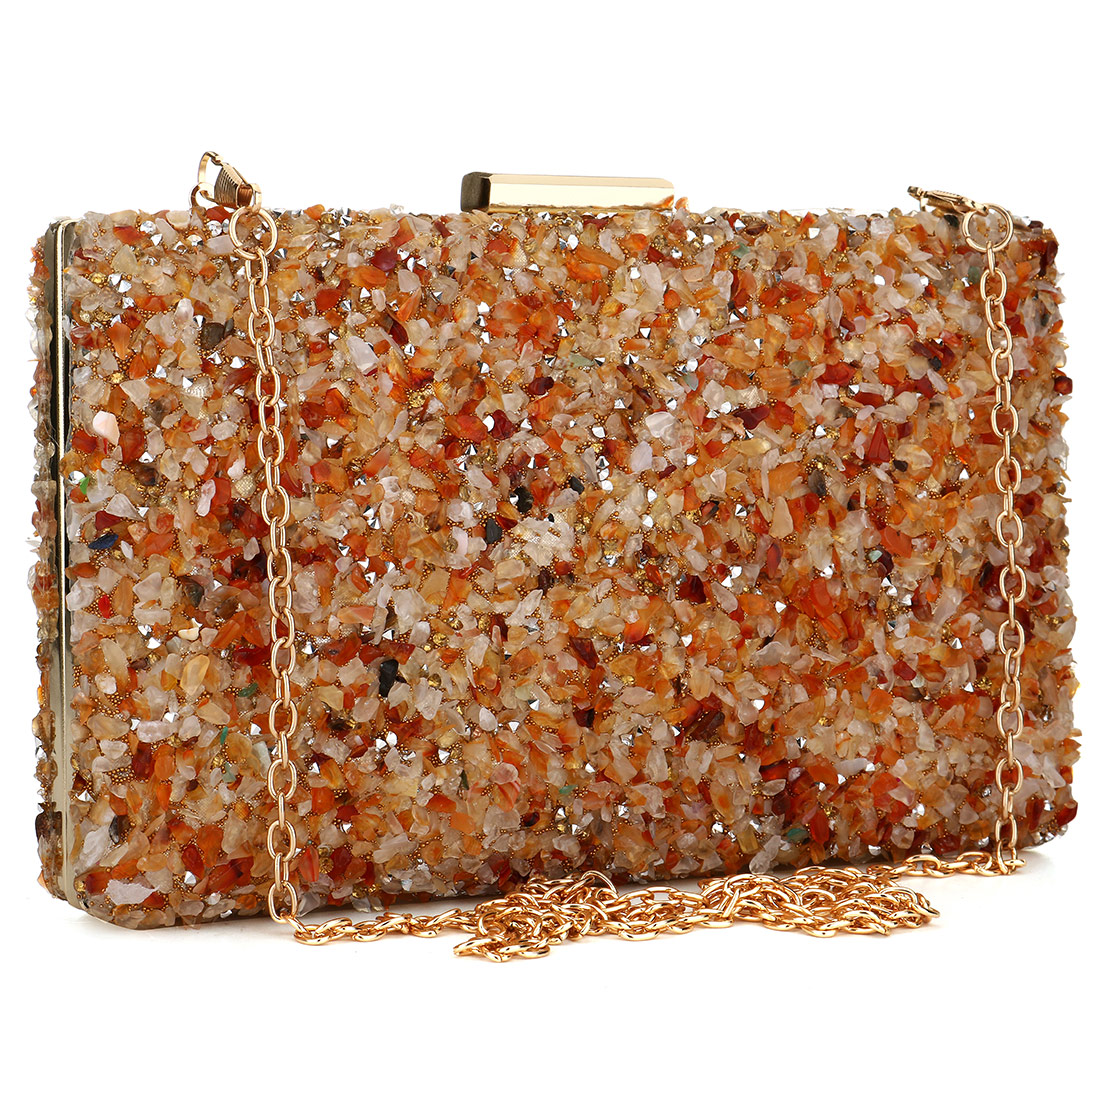 Orange Stone Women Evening Handbag Clutches Purse Lady Diamond Banquet Bag Elegant Female Wedding Party Day Clutch Bags 2019